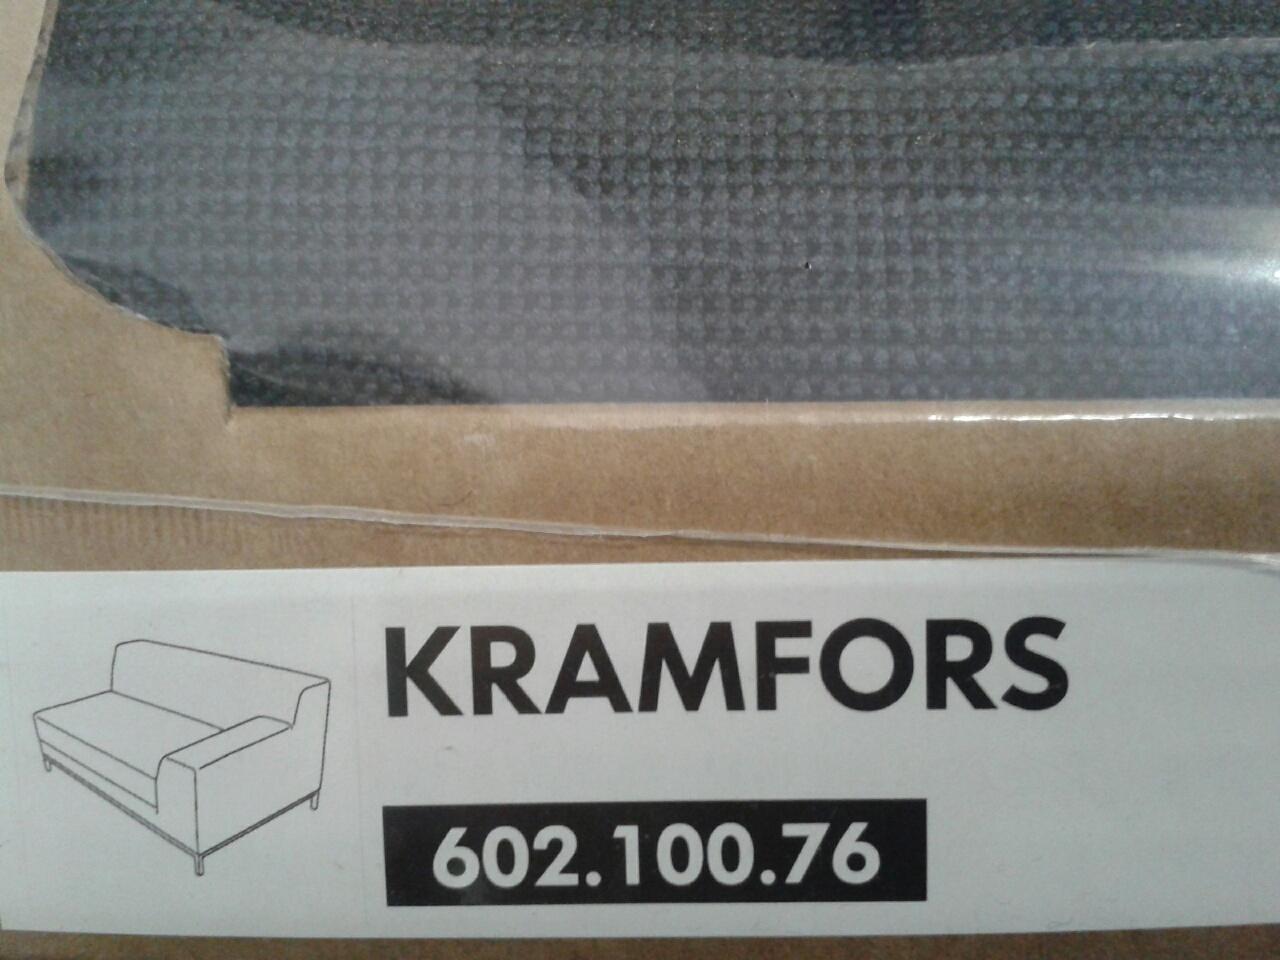 ikea kramfors sofabezug cover sanne grau viele angebote ebay. Black Bedroom Furniture Sets. Home Design Ideas